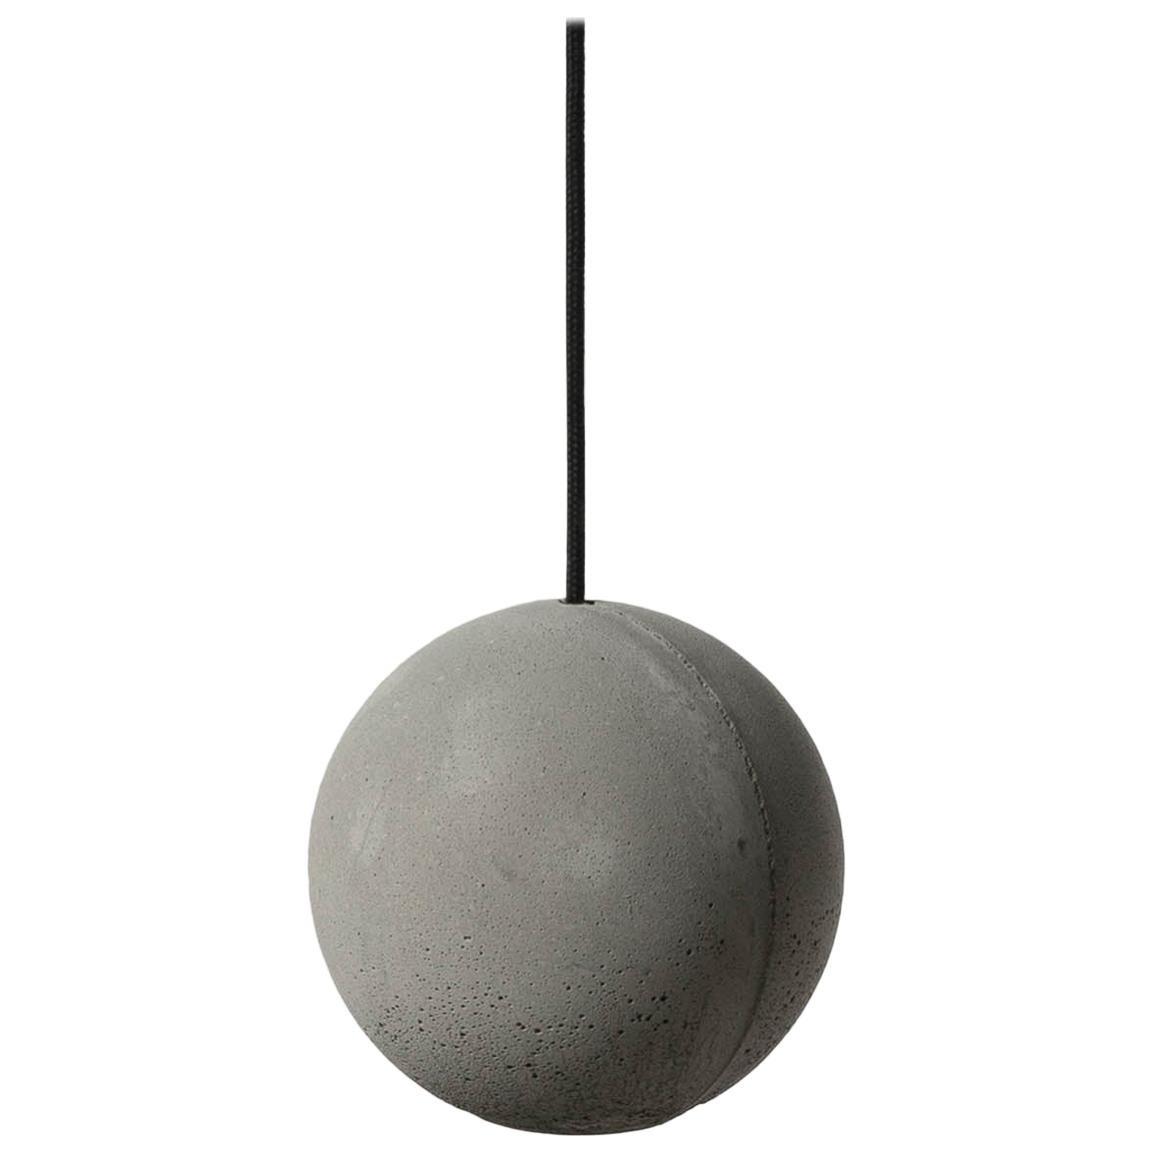 Concrete Pendant Lamp 'Moon S' by Bentu Design